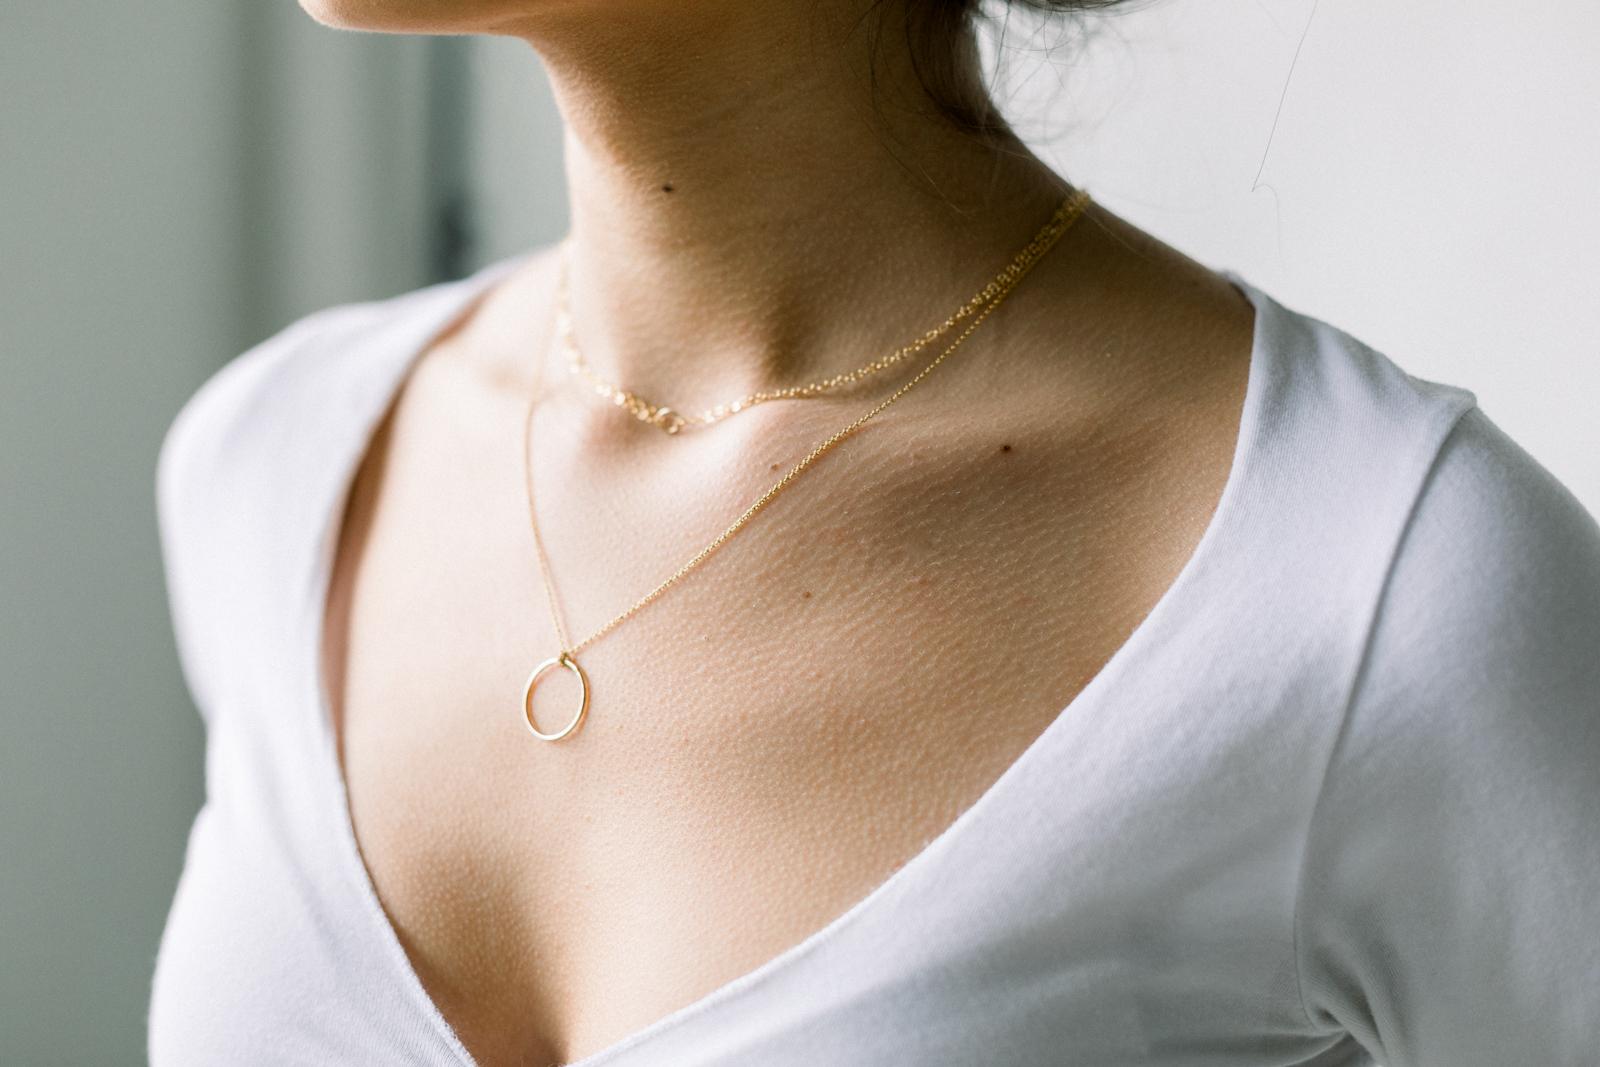 190217-0018-Rachelle-Celine-Handmade-Jewelry-DC-Elisenda-Llinares